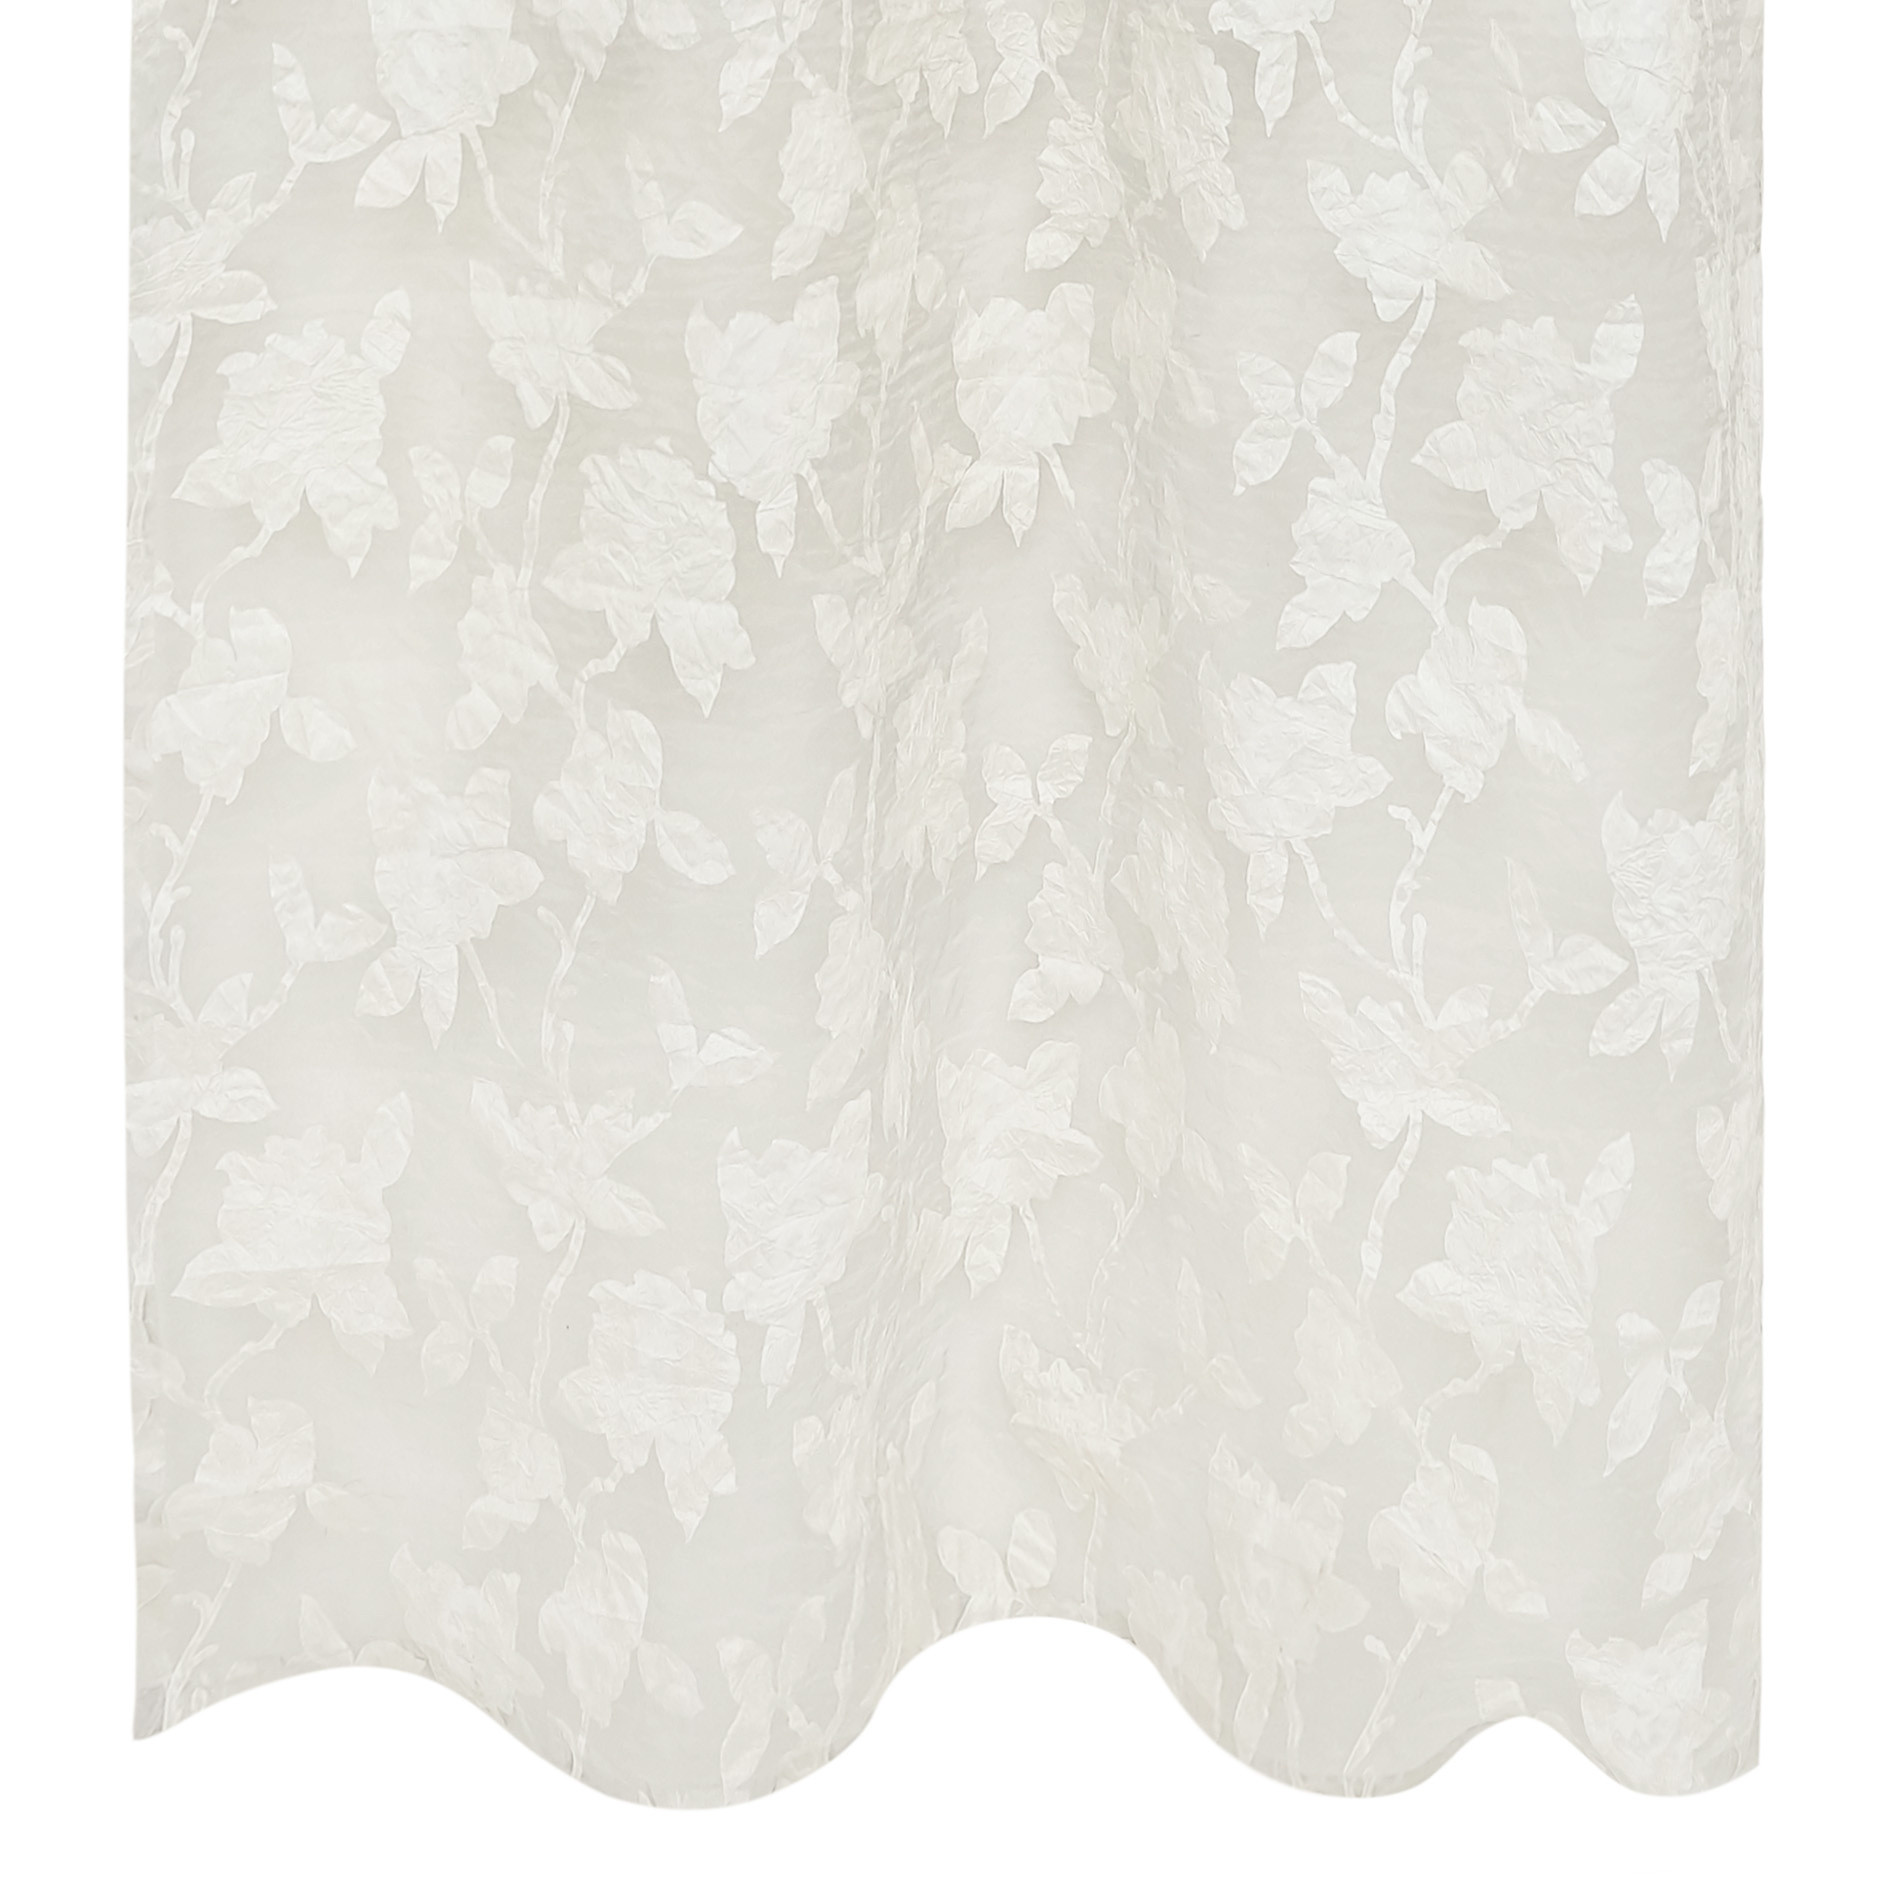 Tenda stampa rose devore, Bianco, large image number 1